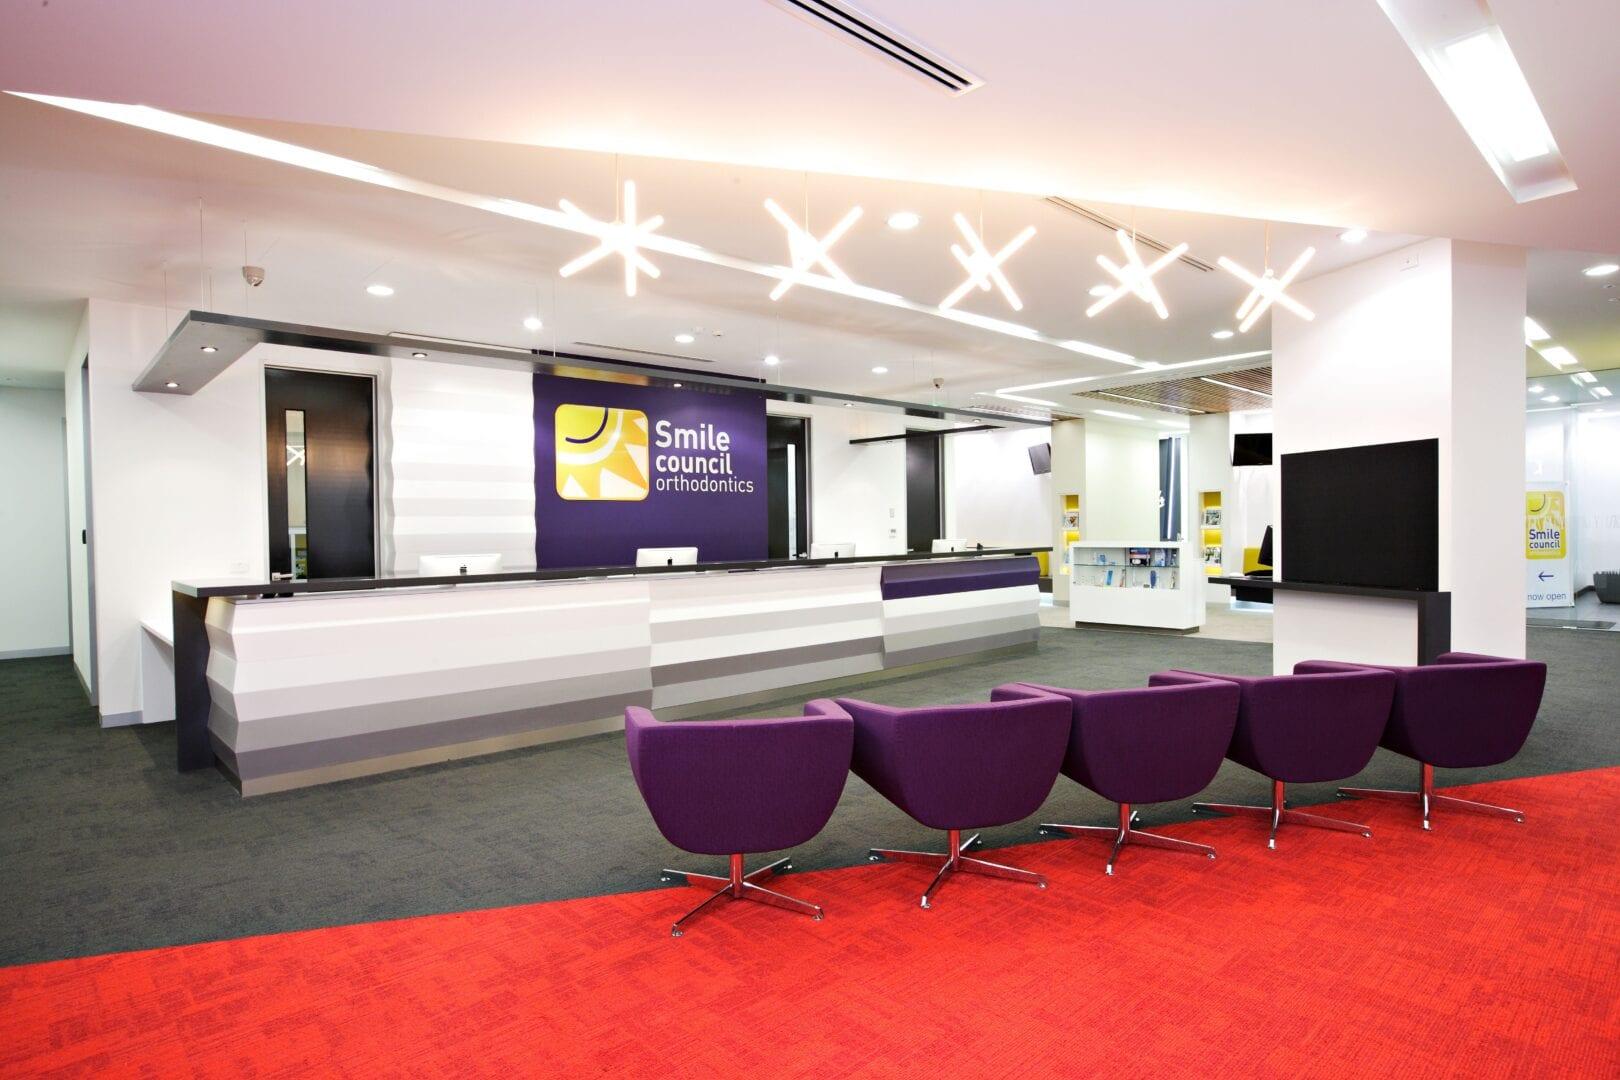 Smile Council Reception area